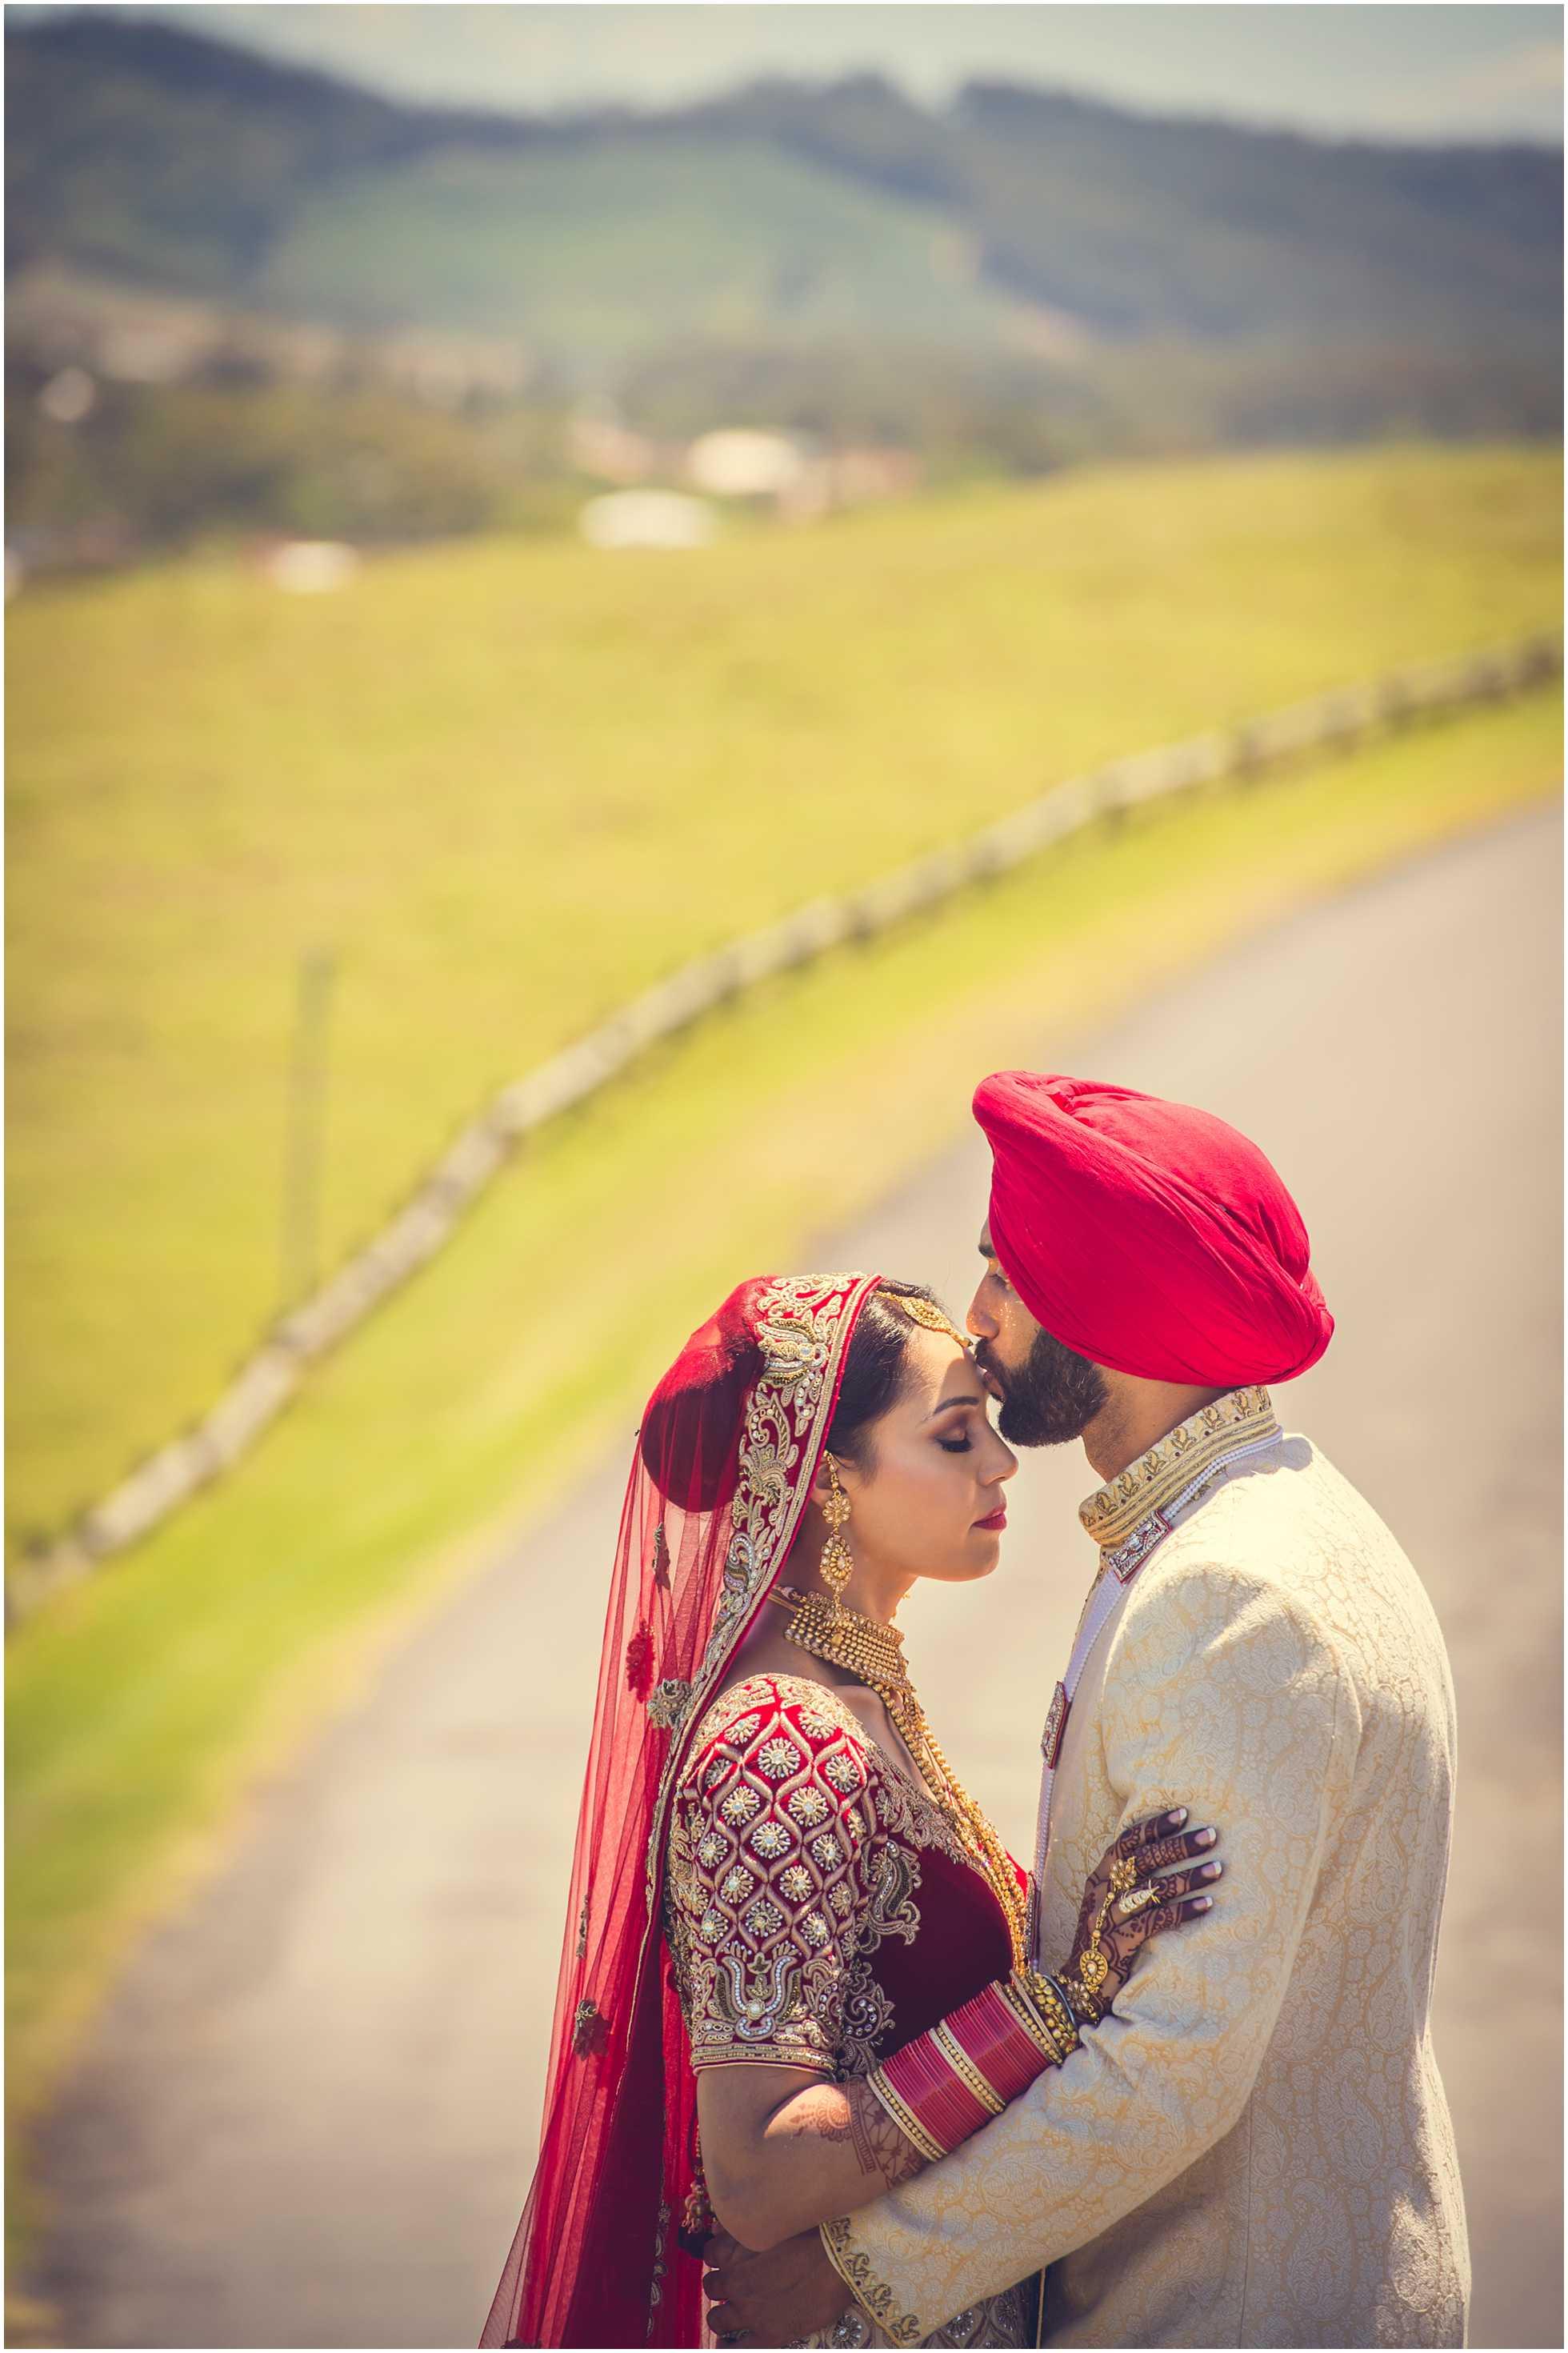 Punjabi Wedding Photoshoot in Coffs Harbour Australia